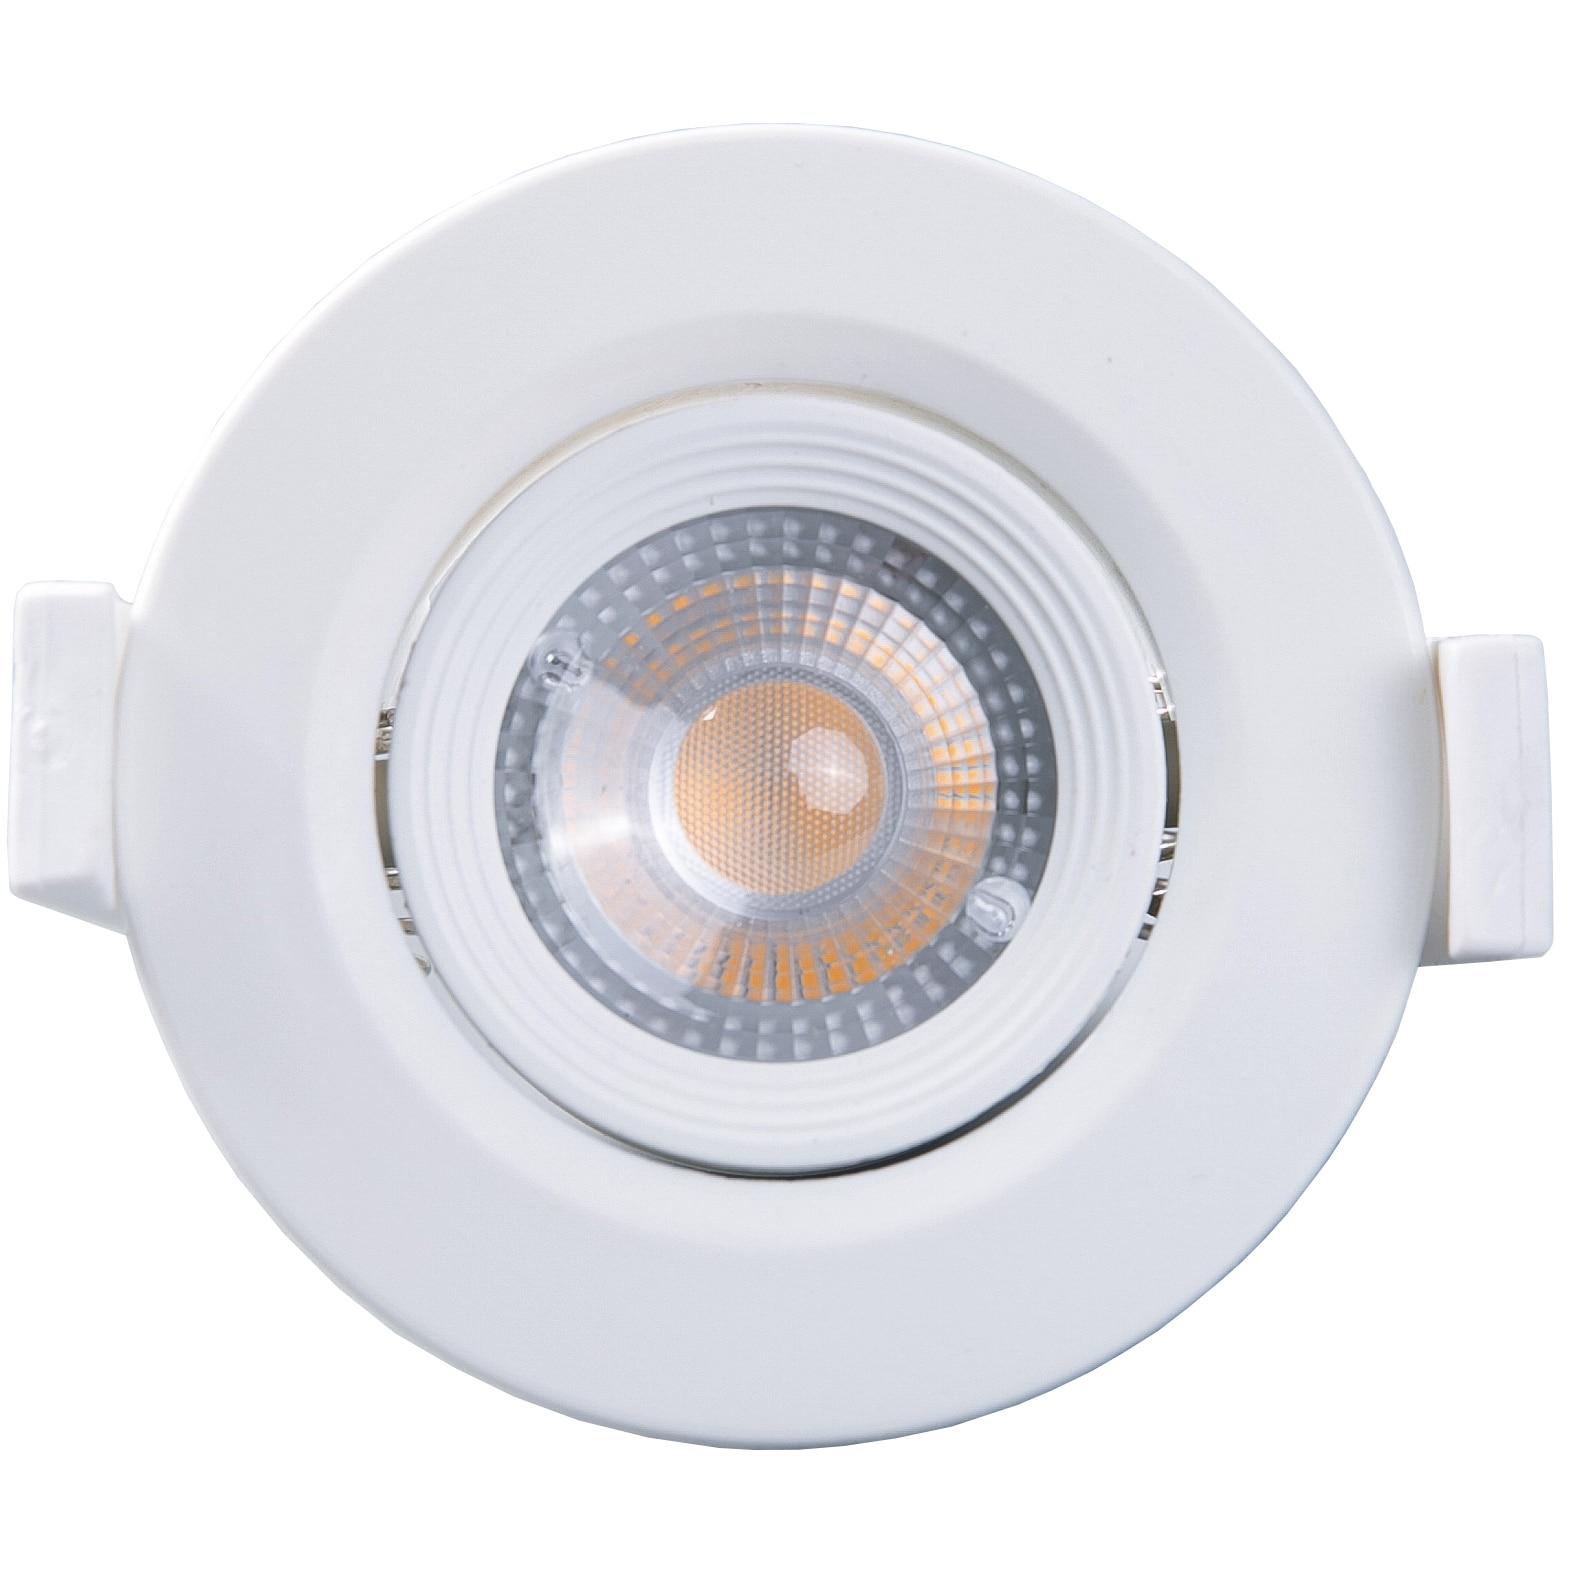 Fotografie Spot LED incastrabil Well Glamor, rotund, 3W, 240 lm, temperatura lumina 4000K, 60mm